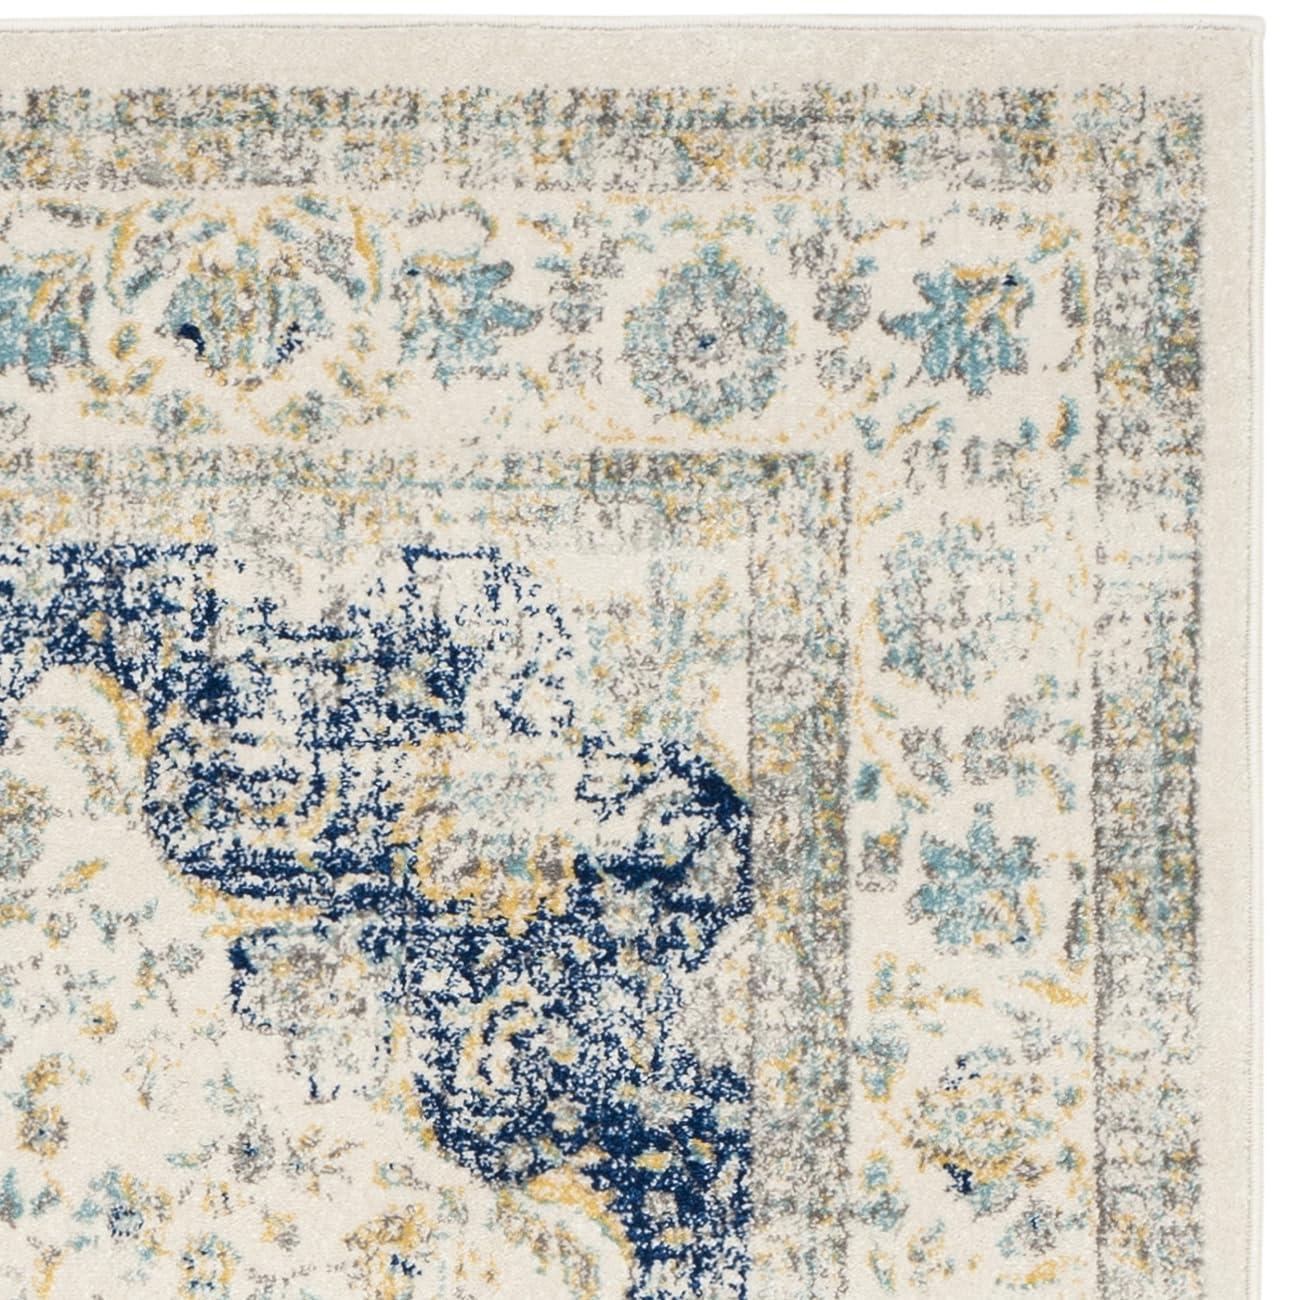 Safavieh Evoke Collection EVK220C Oriental Vintage Ivory and Blue Area Rug (9' x 12') 3